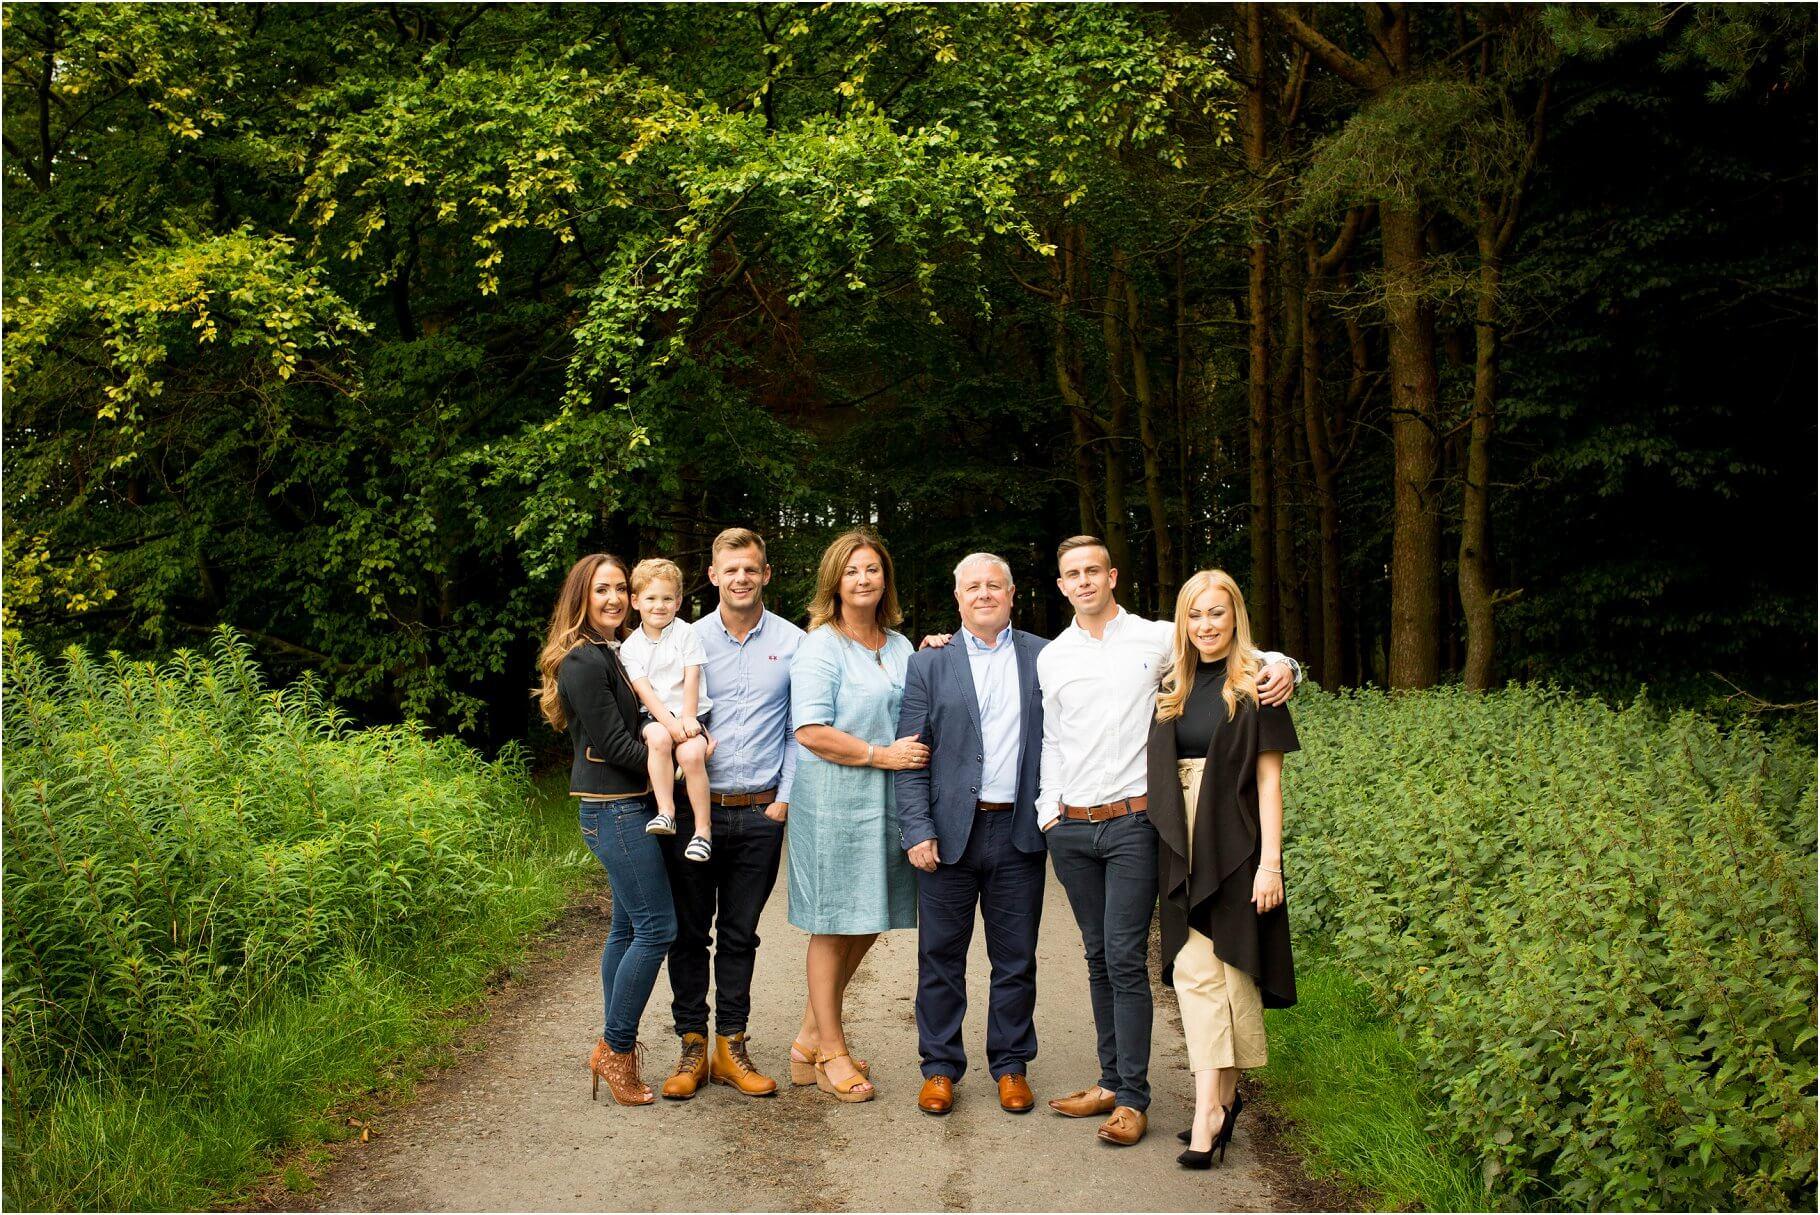 Fun Family Photo Shoots in Lancashire